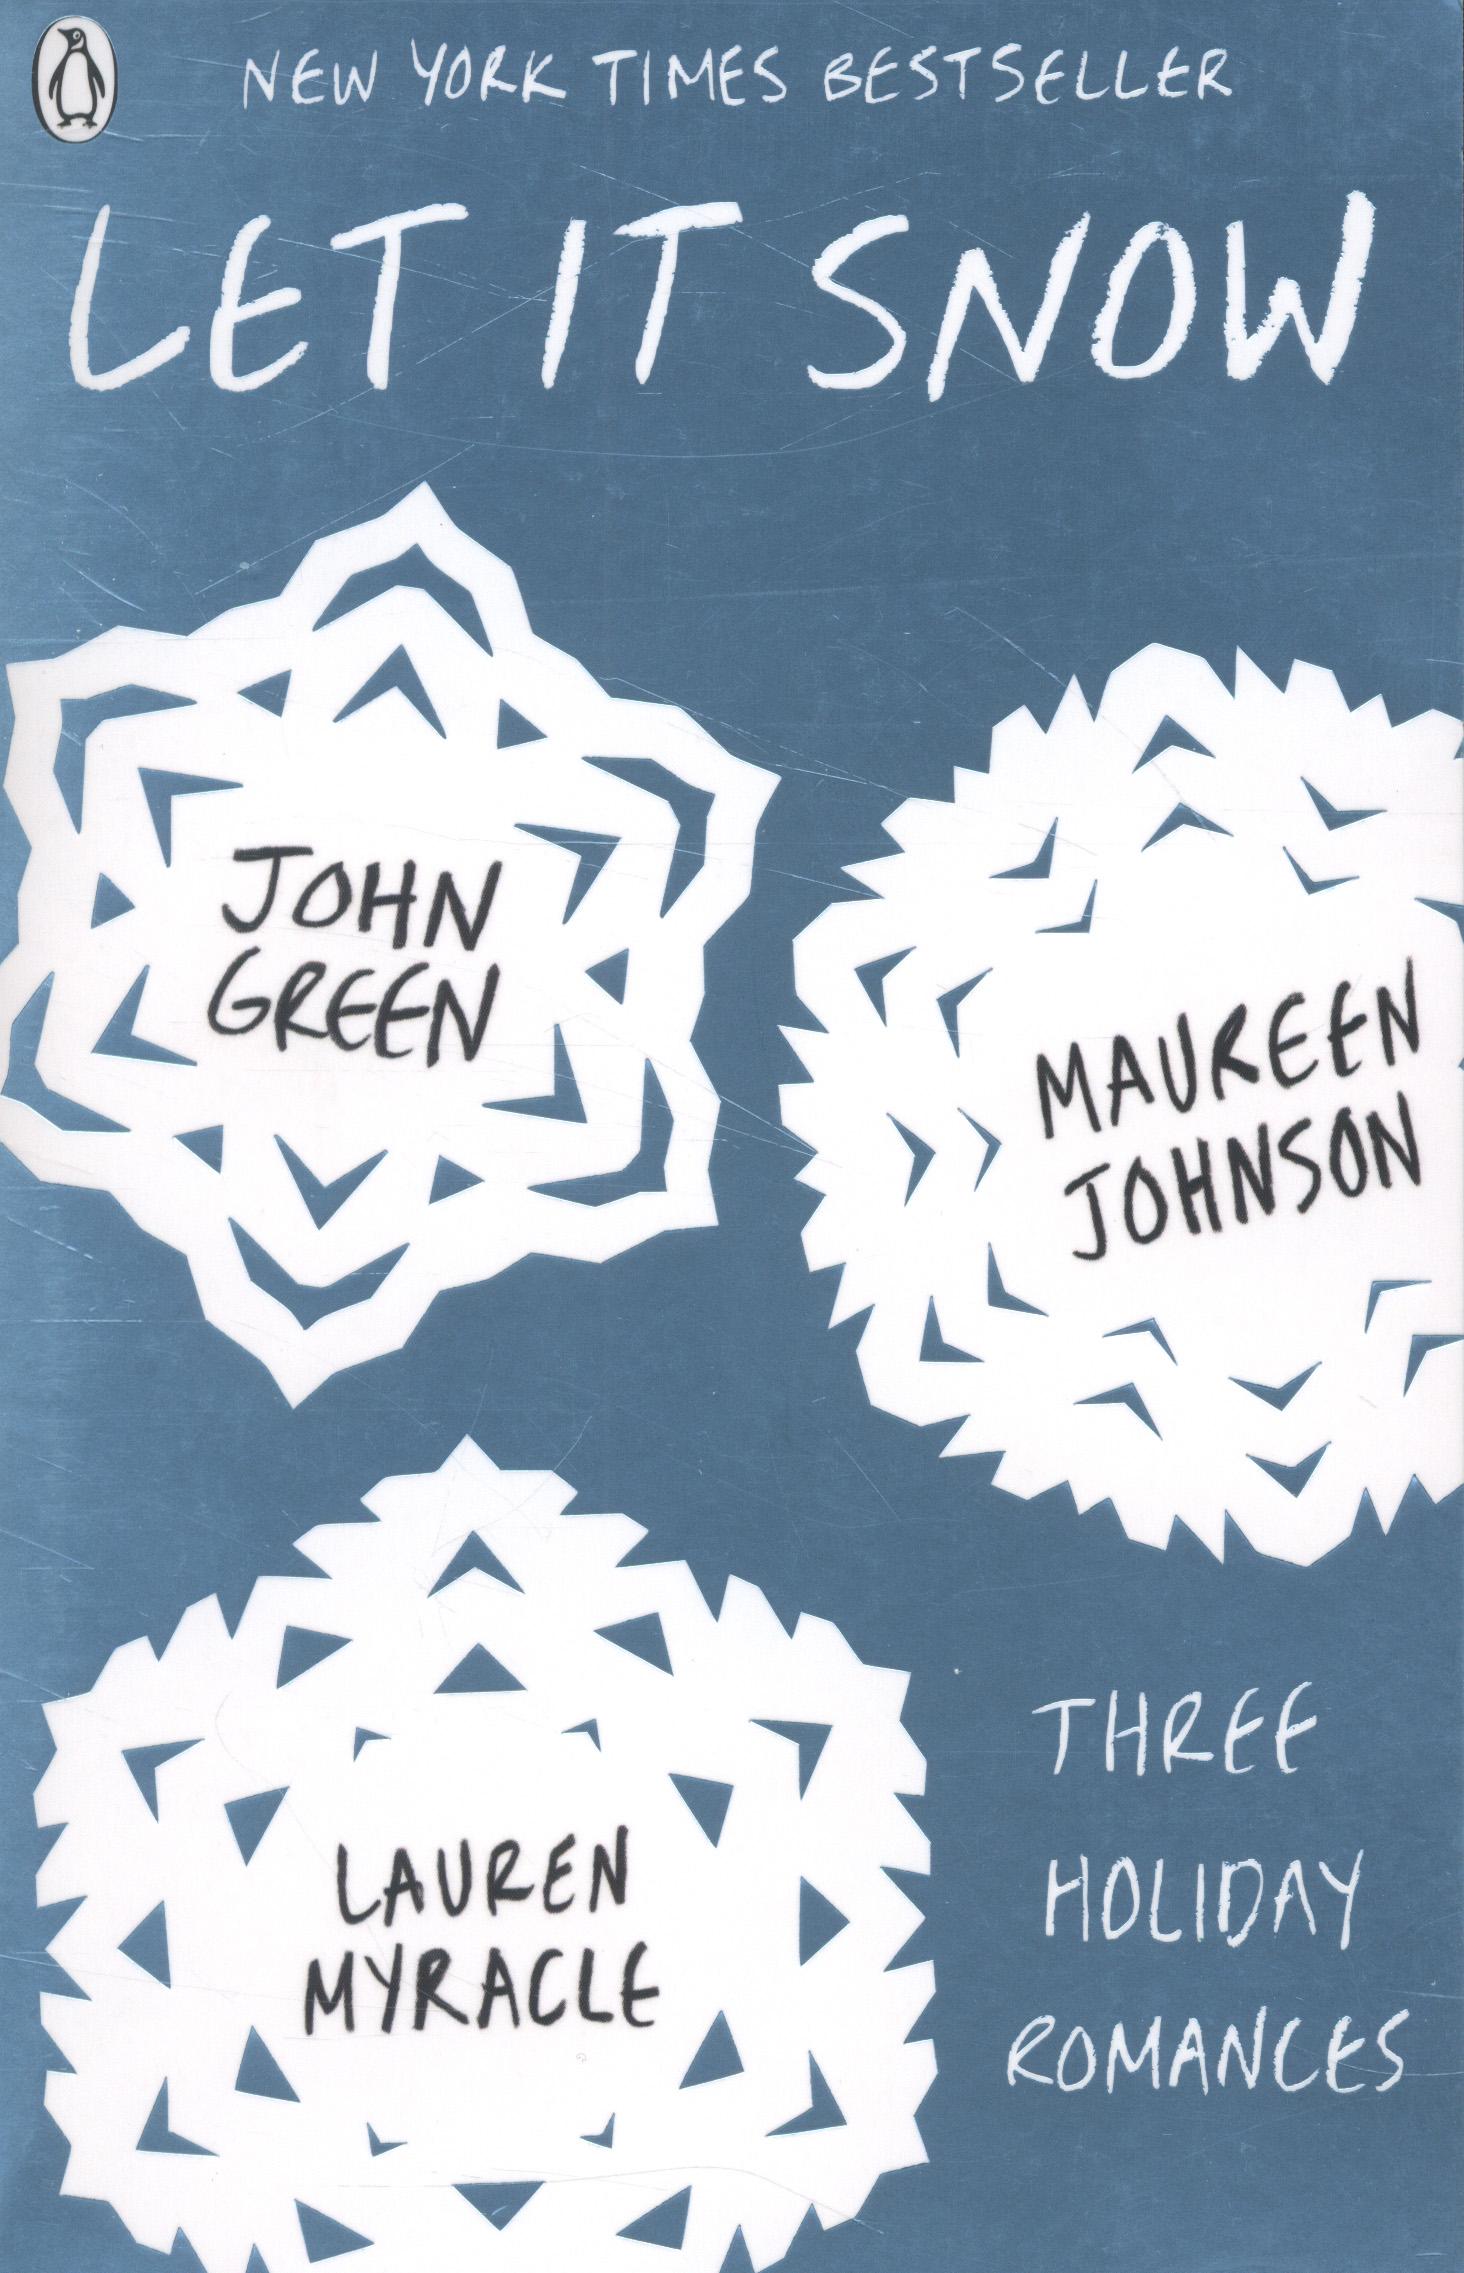 Let it Snow John Green Book 3 Holiday Romances (BK-81)